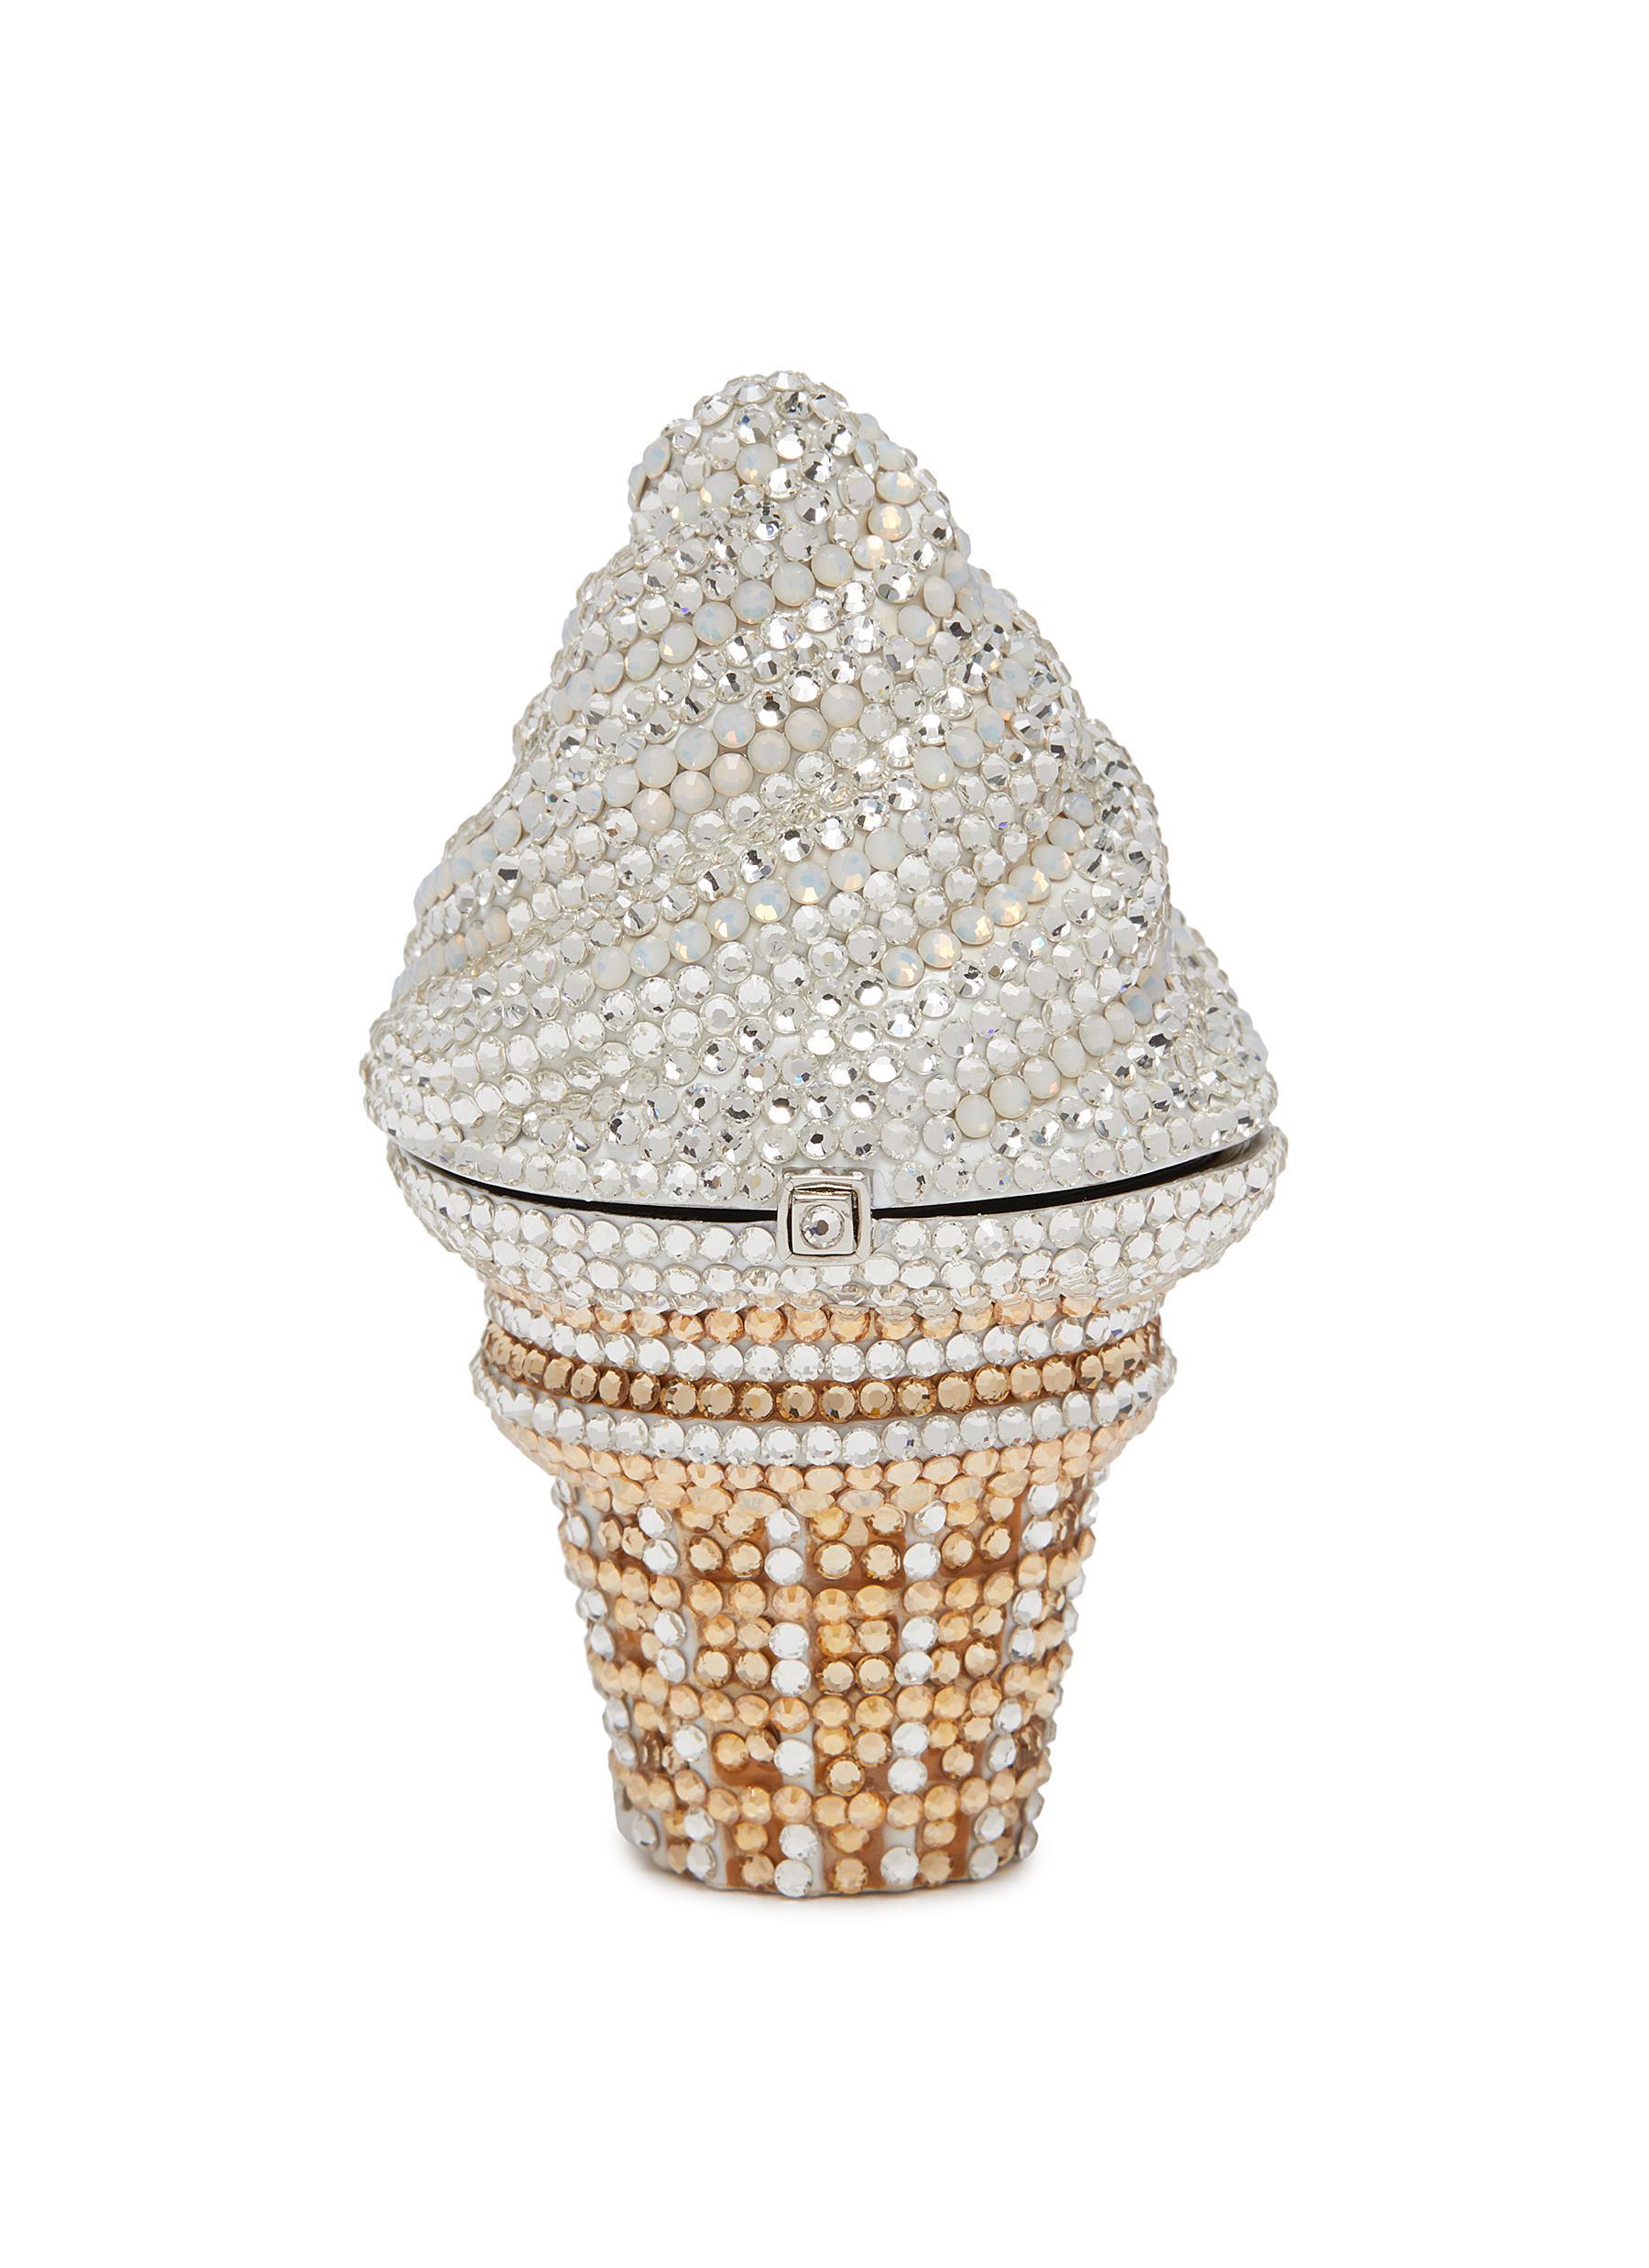 Ice Cream Cone Pillbox Vanilla' Embellished Bag